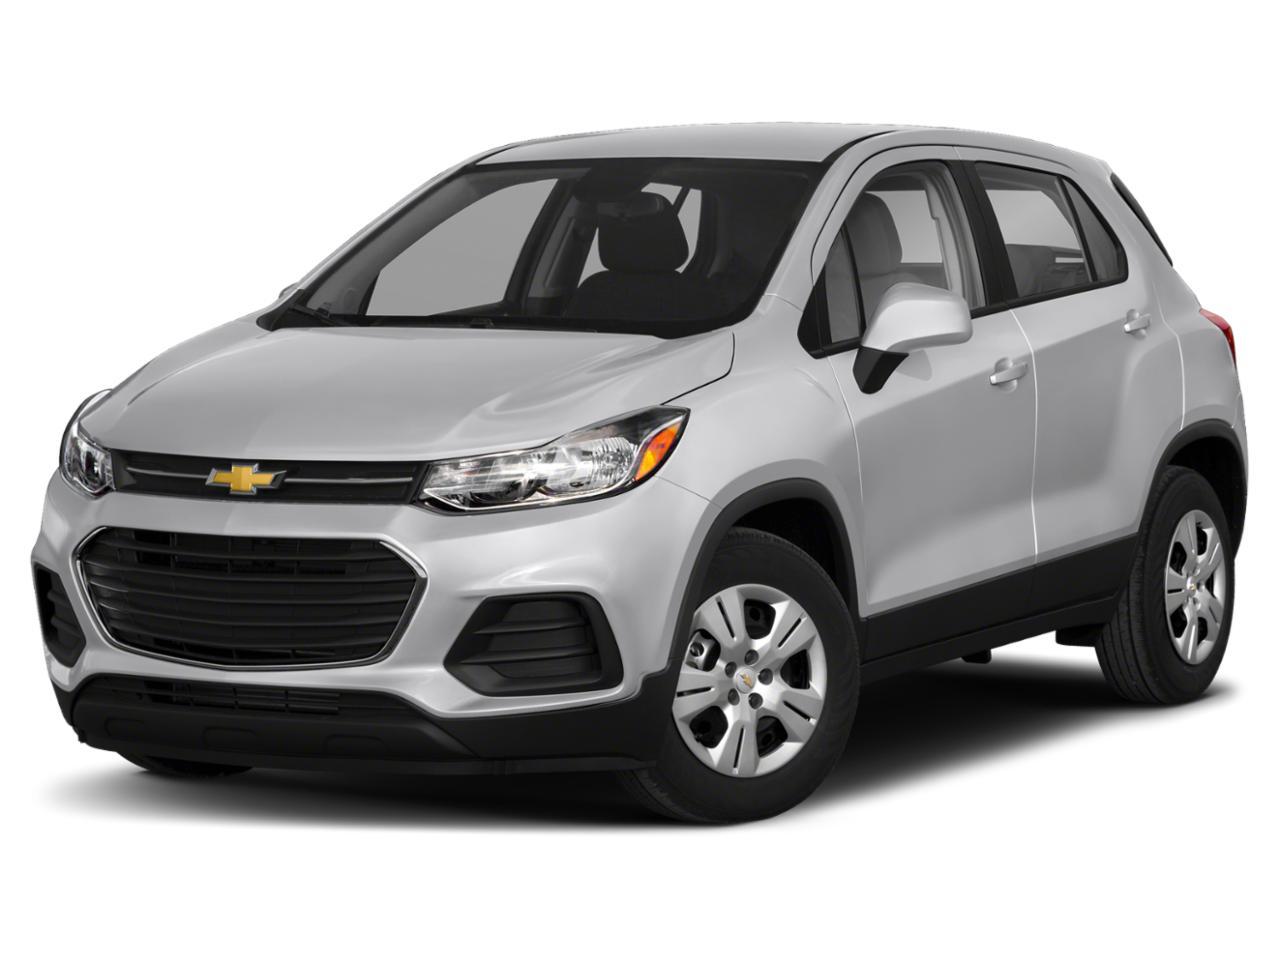 2018 Chevrolet Trax LS SUV Slide